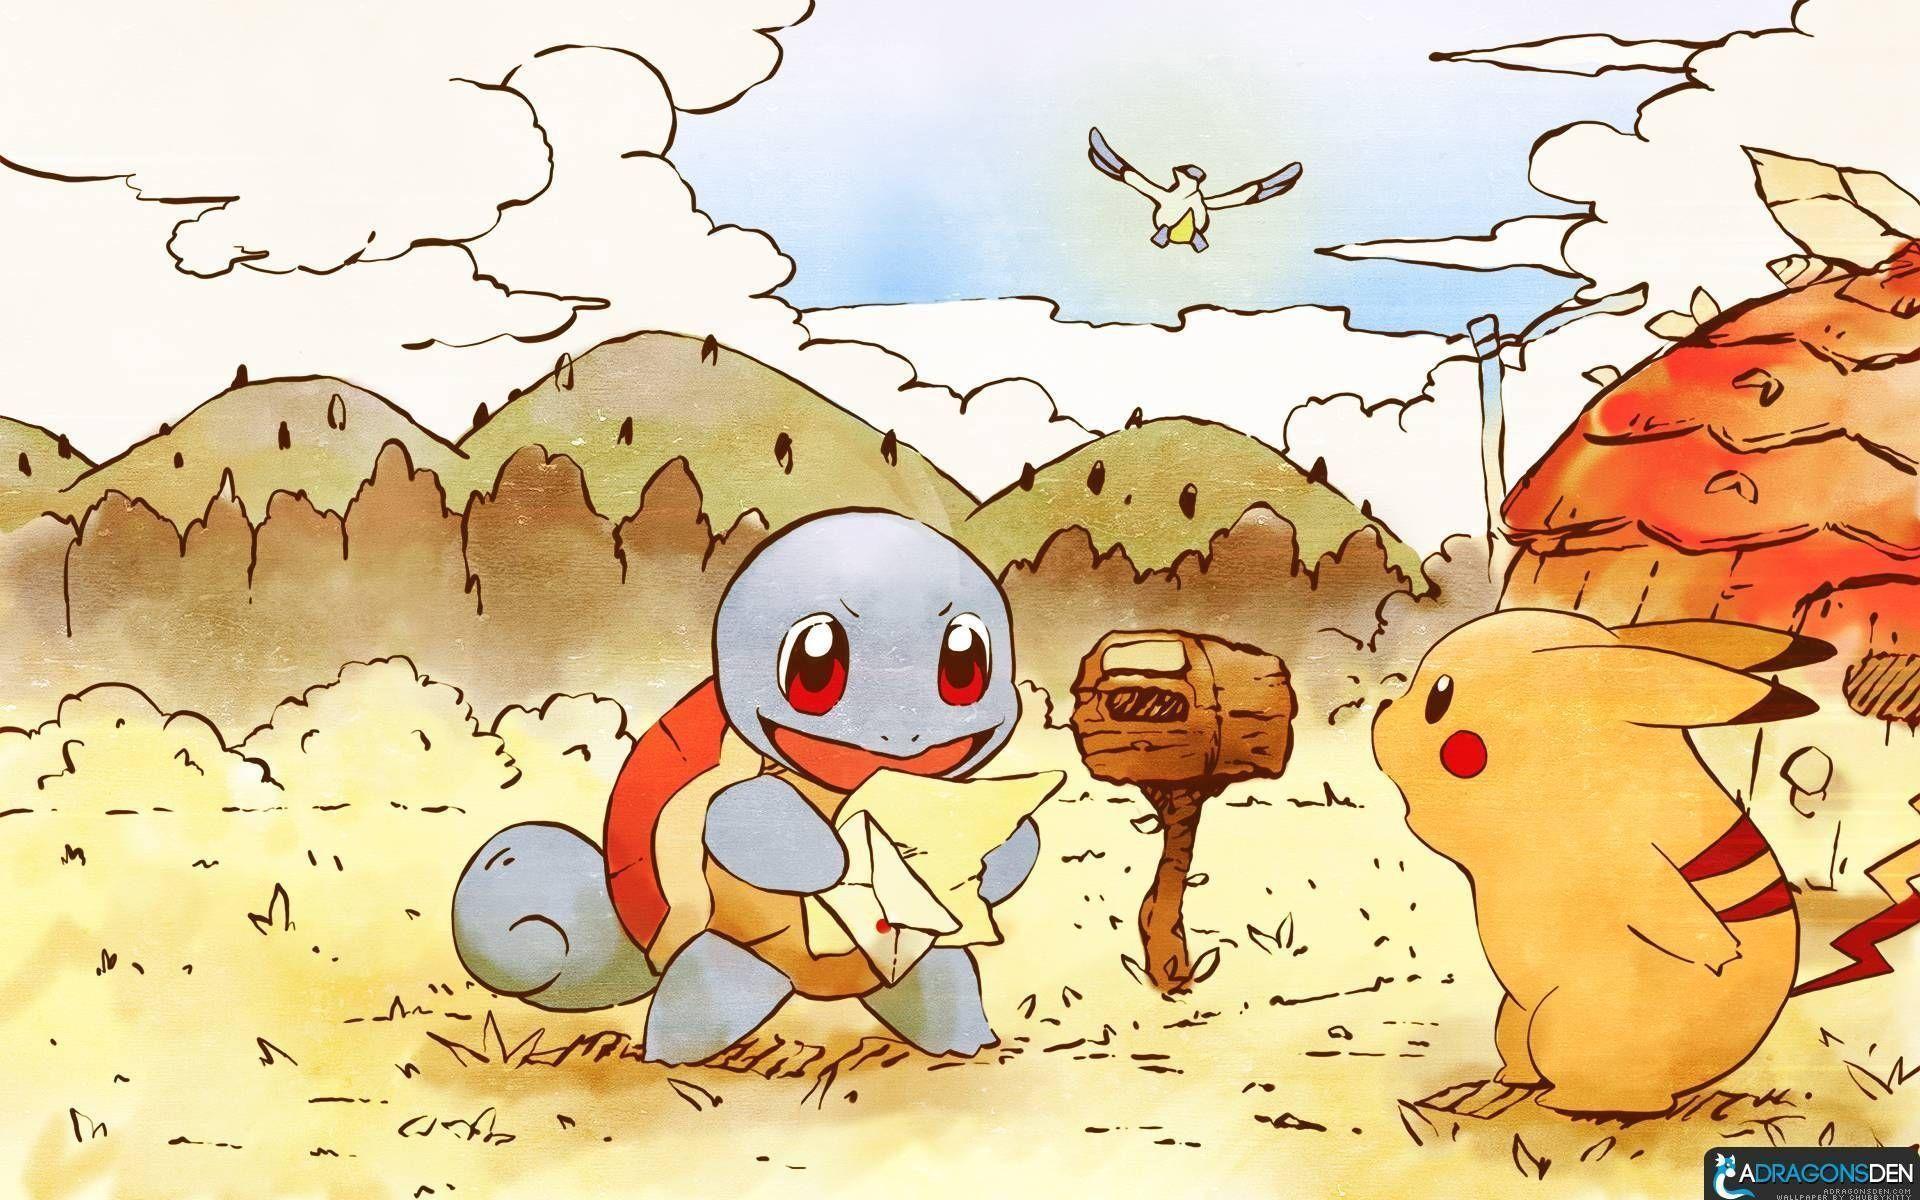 Res: 1920x1200, Cute Pokemon Wallpaper | Download Wallpapers